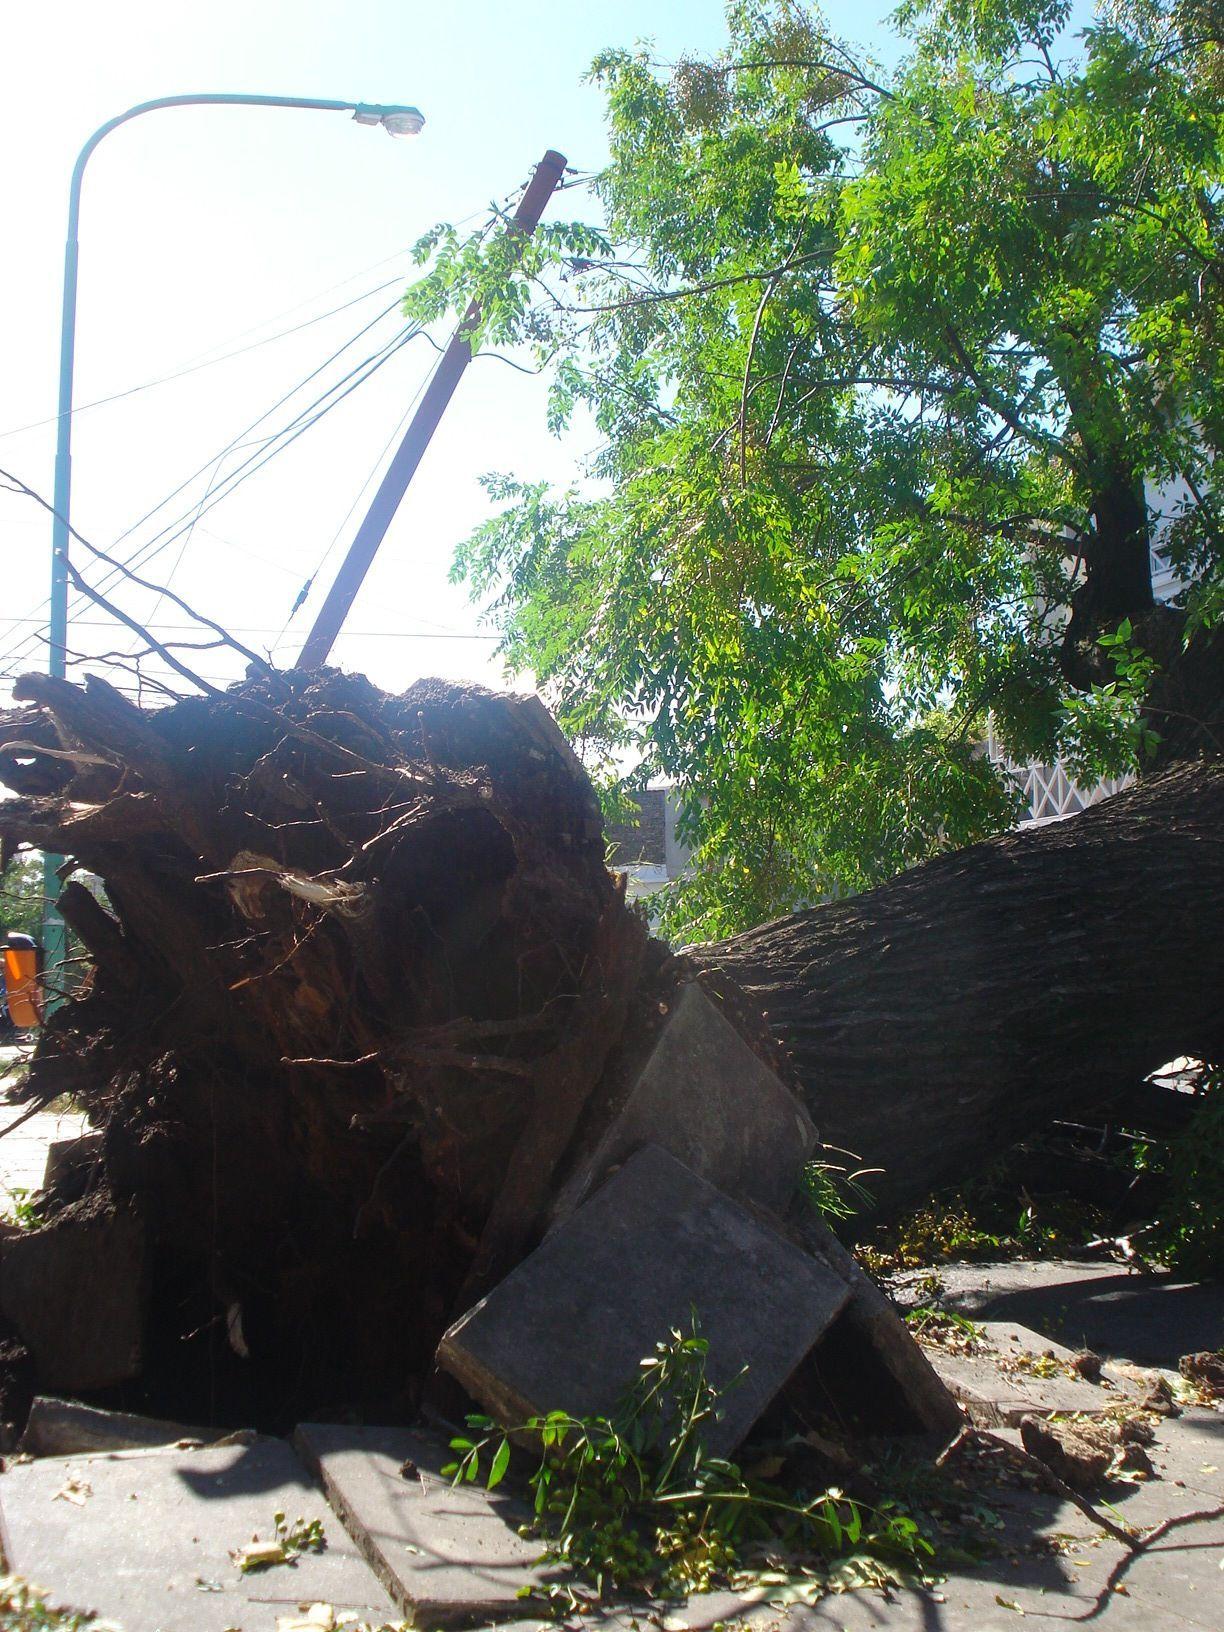 #argentina #tormenta #tornado #storm  Arranco toda la vereda el arbol ! :D toda la potencia :|